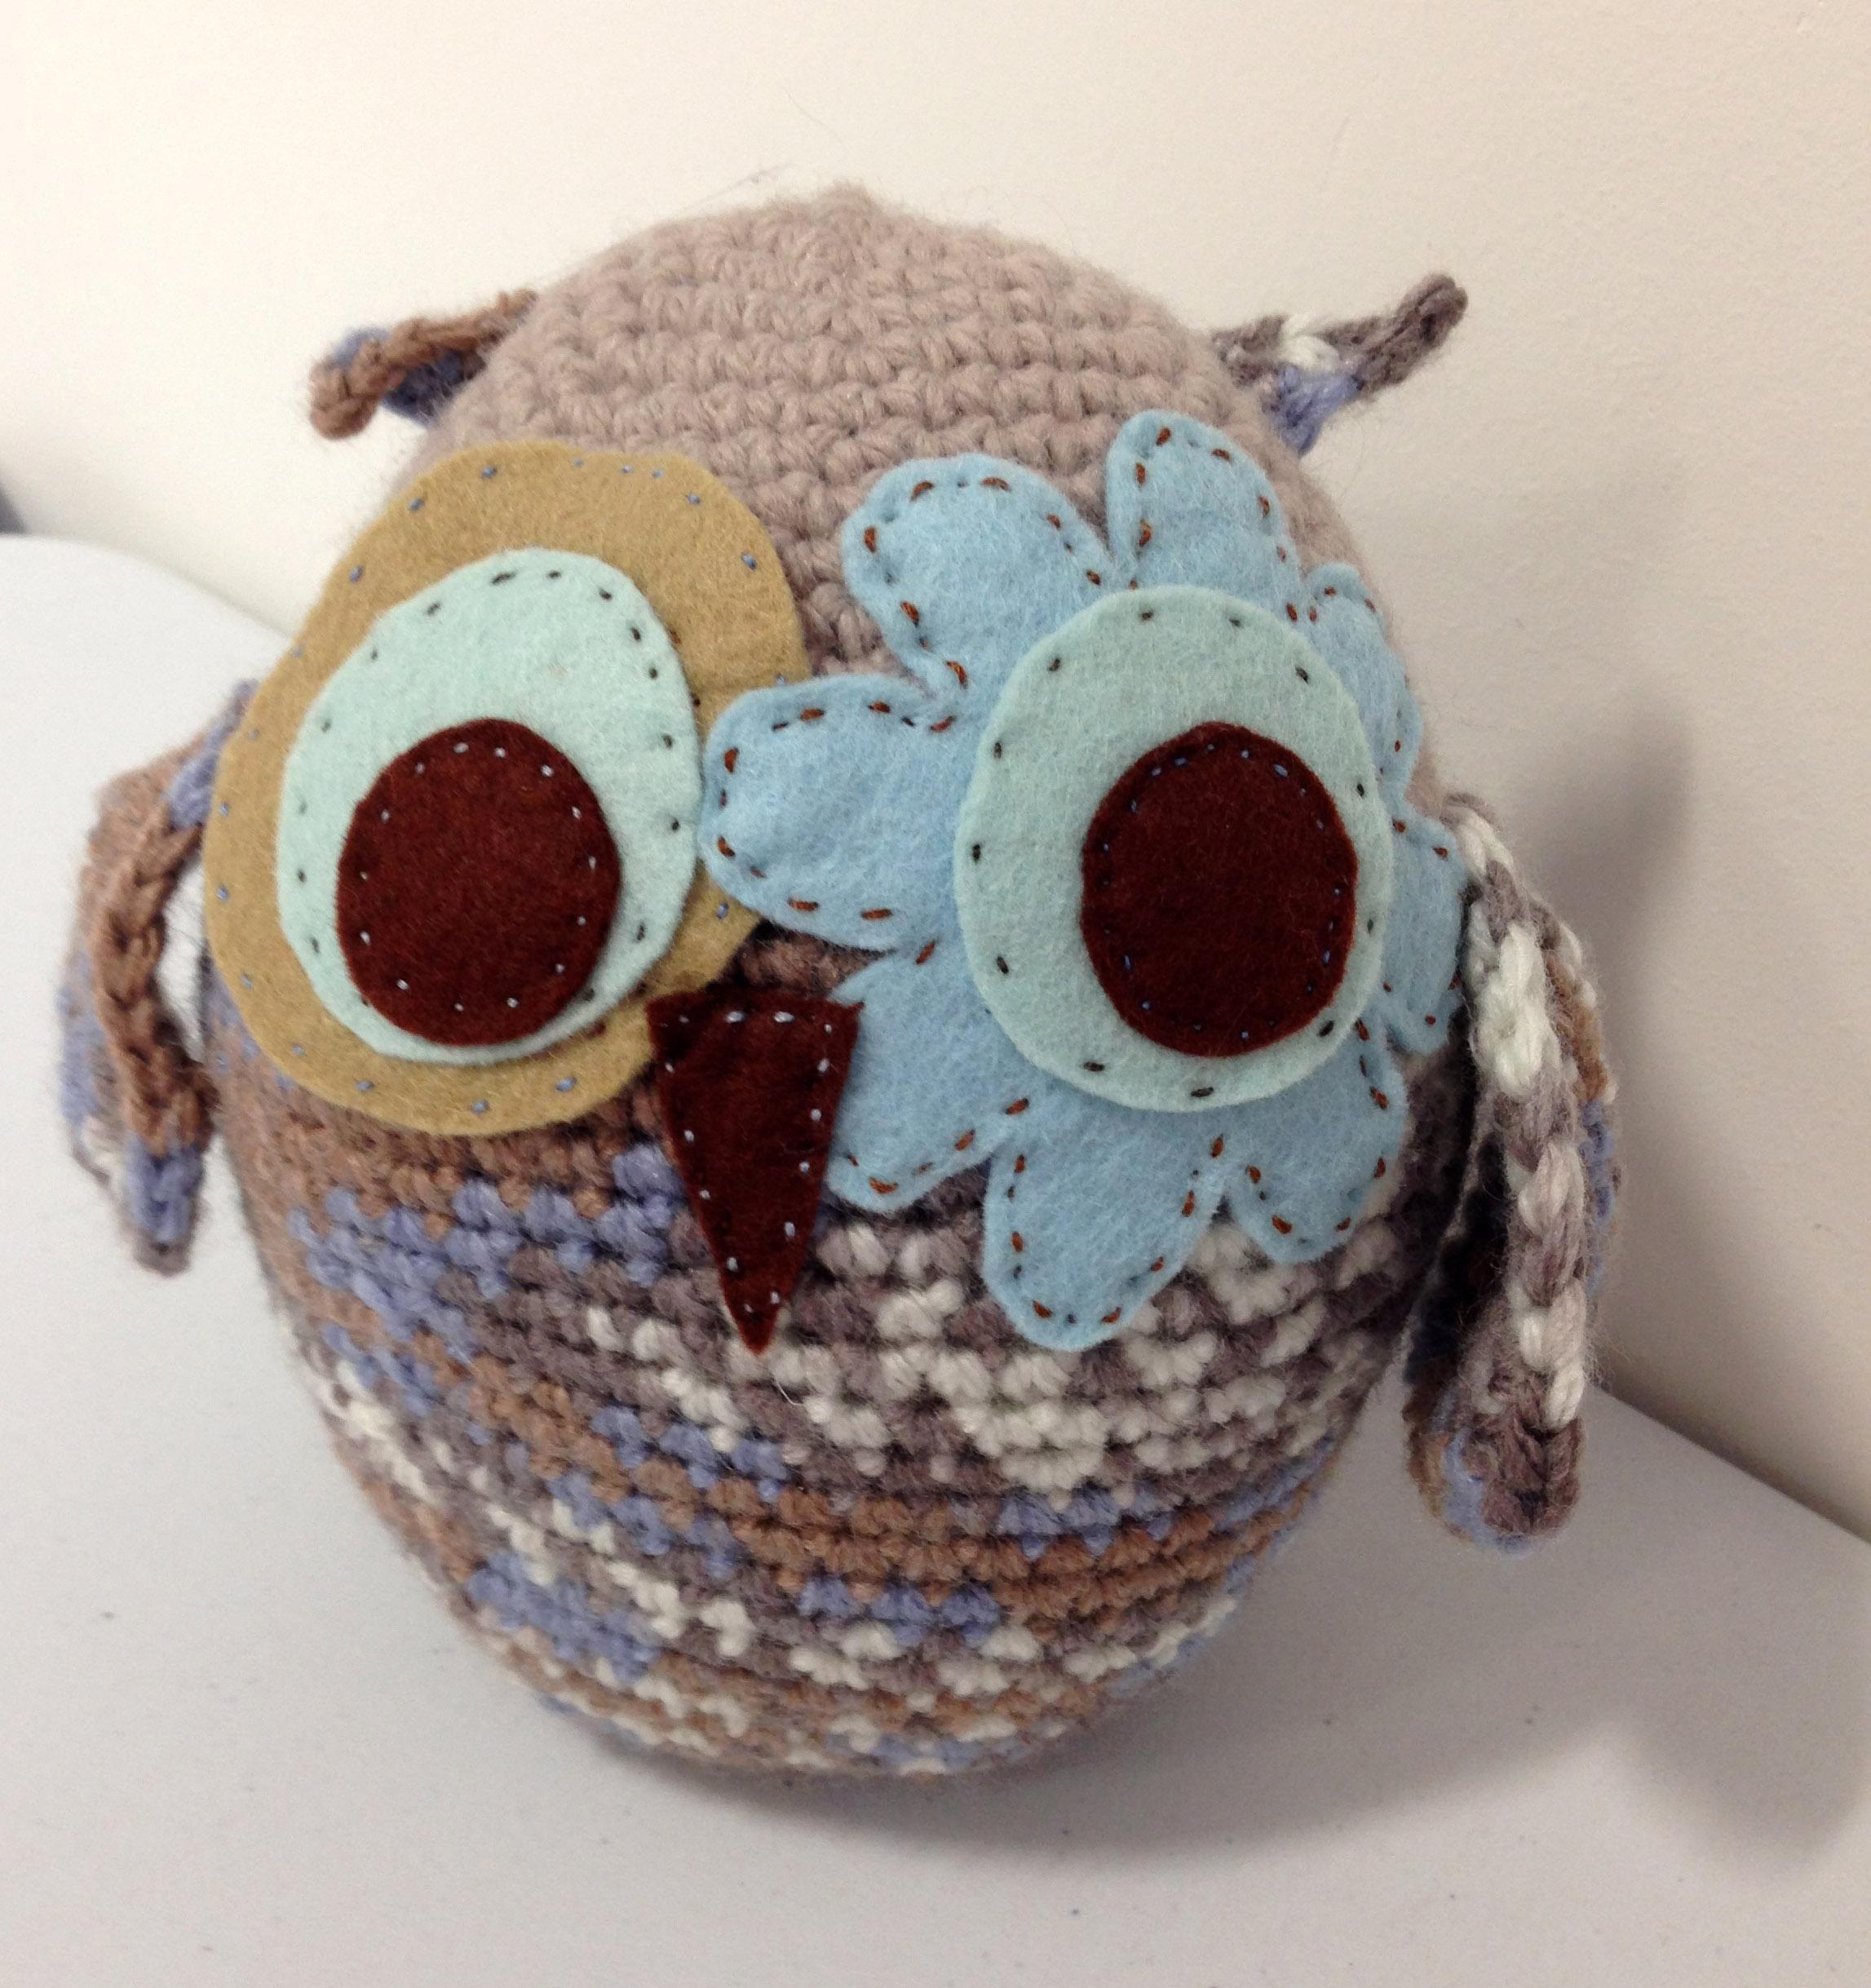 Crochet Amigurumi Course StraightCurves, Chesterfield